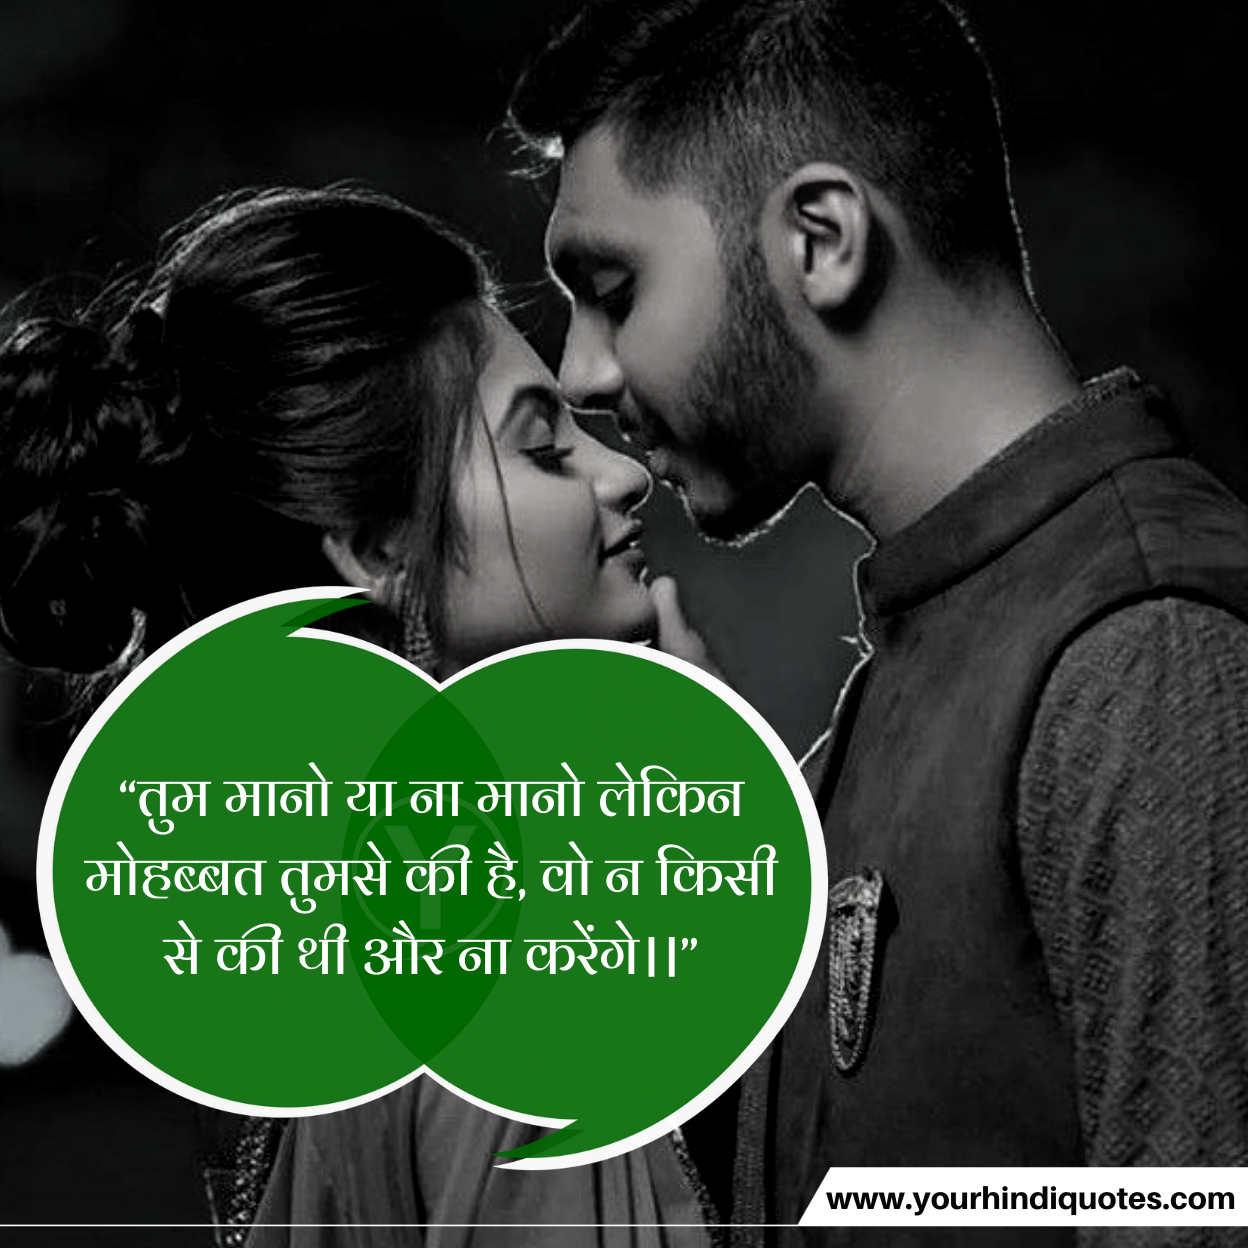 Hindi Good Morning Shayari Image